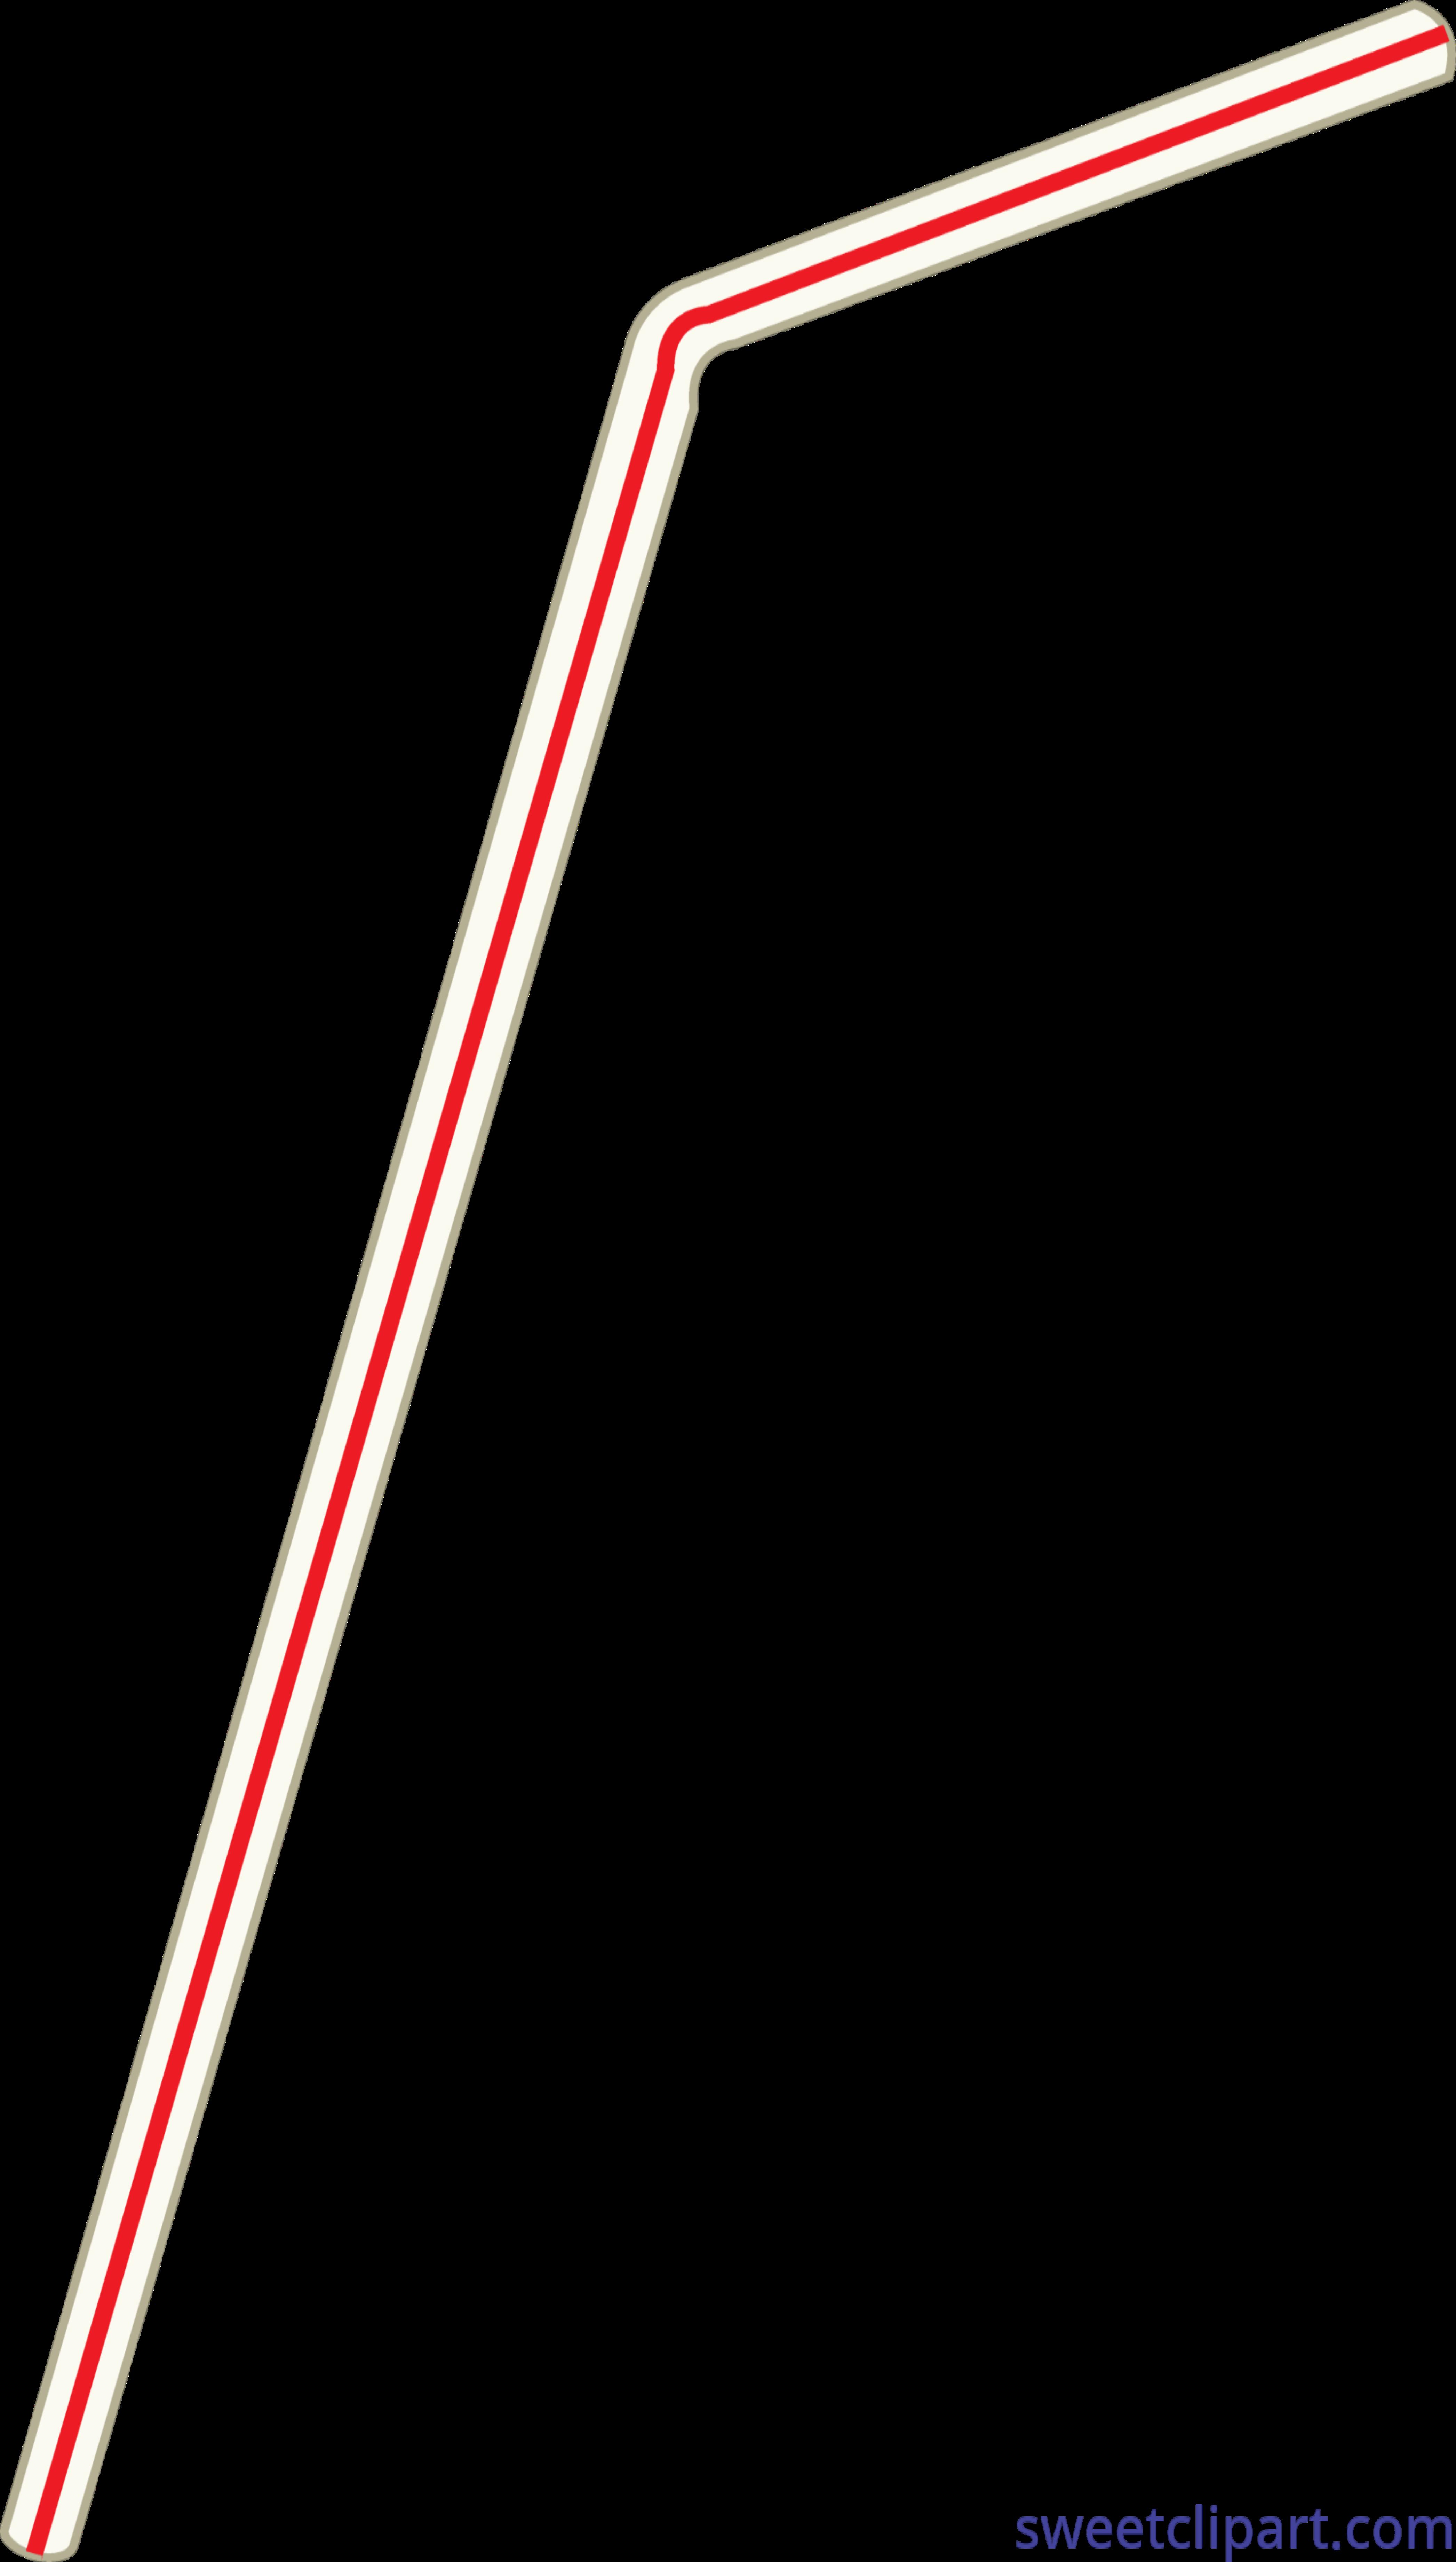 Clip art sweet. Straw clipart